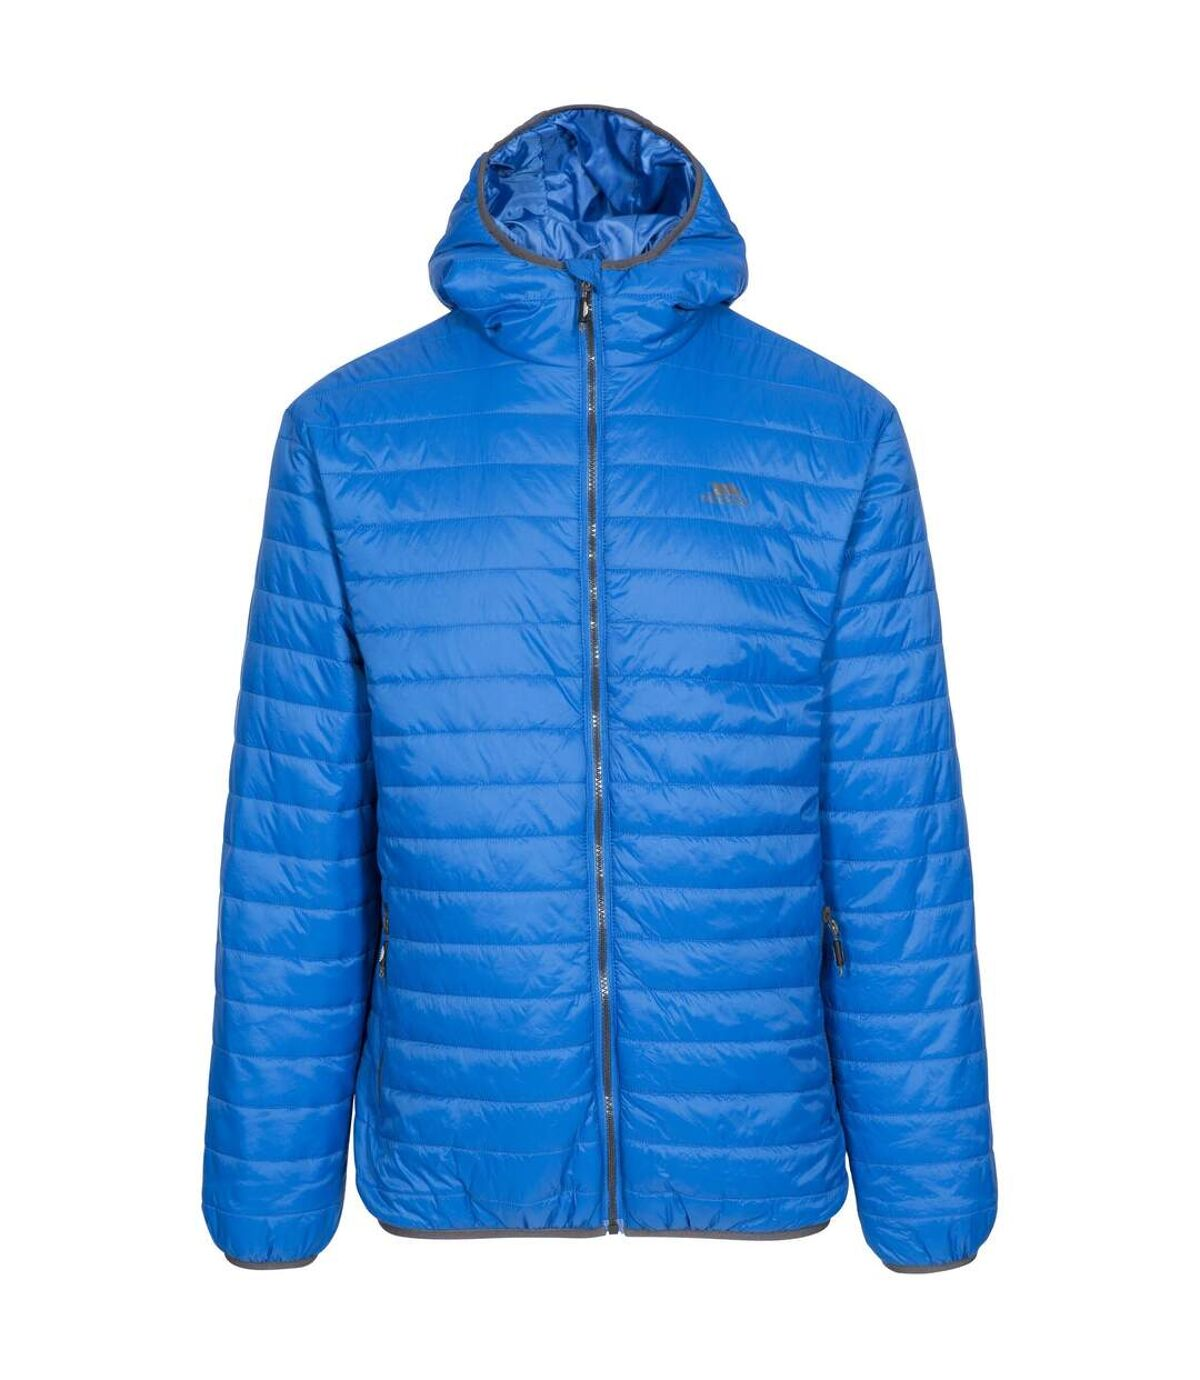 Trespass Mens Dunbar Padded Jacket (Blue) - UTTP4285